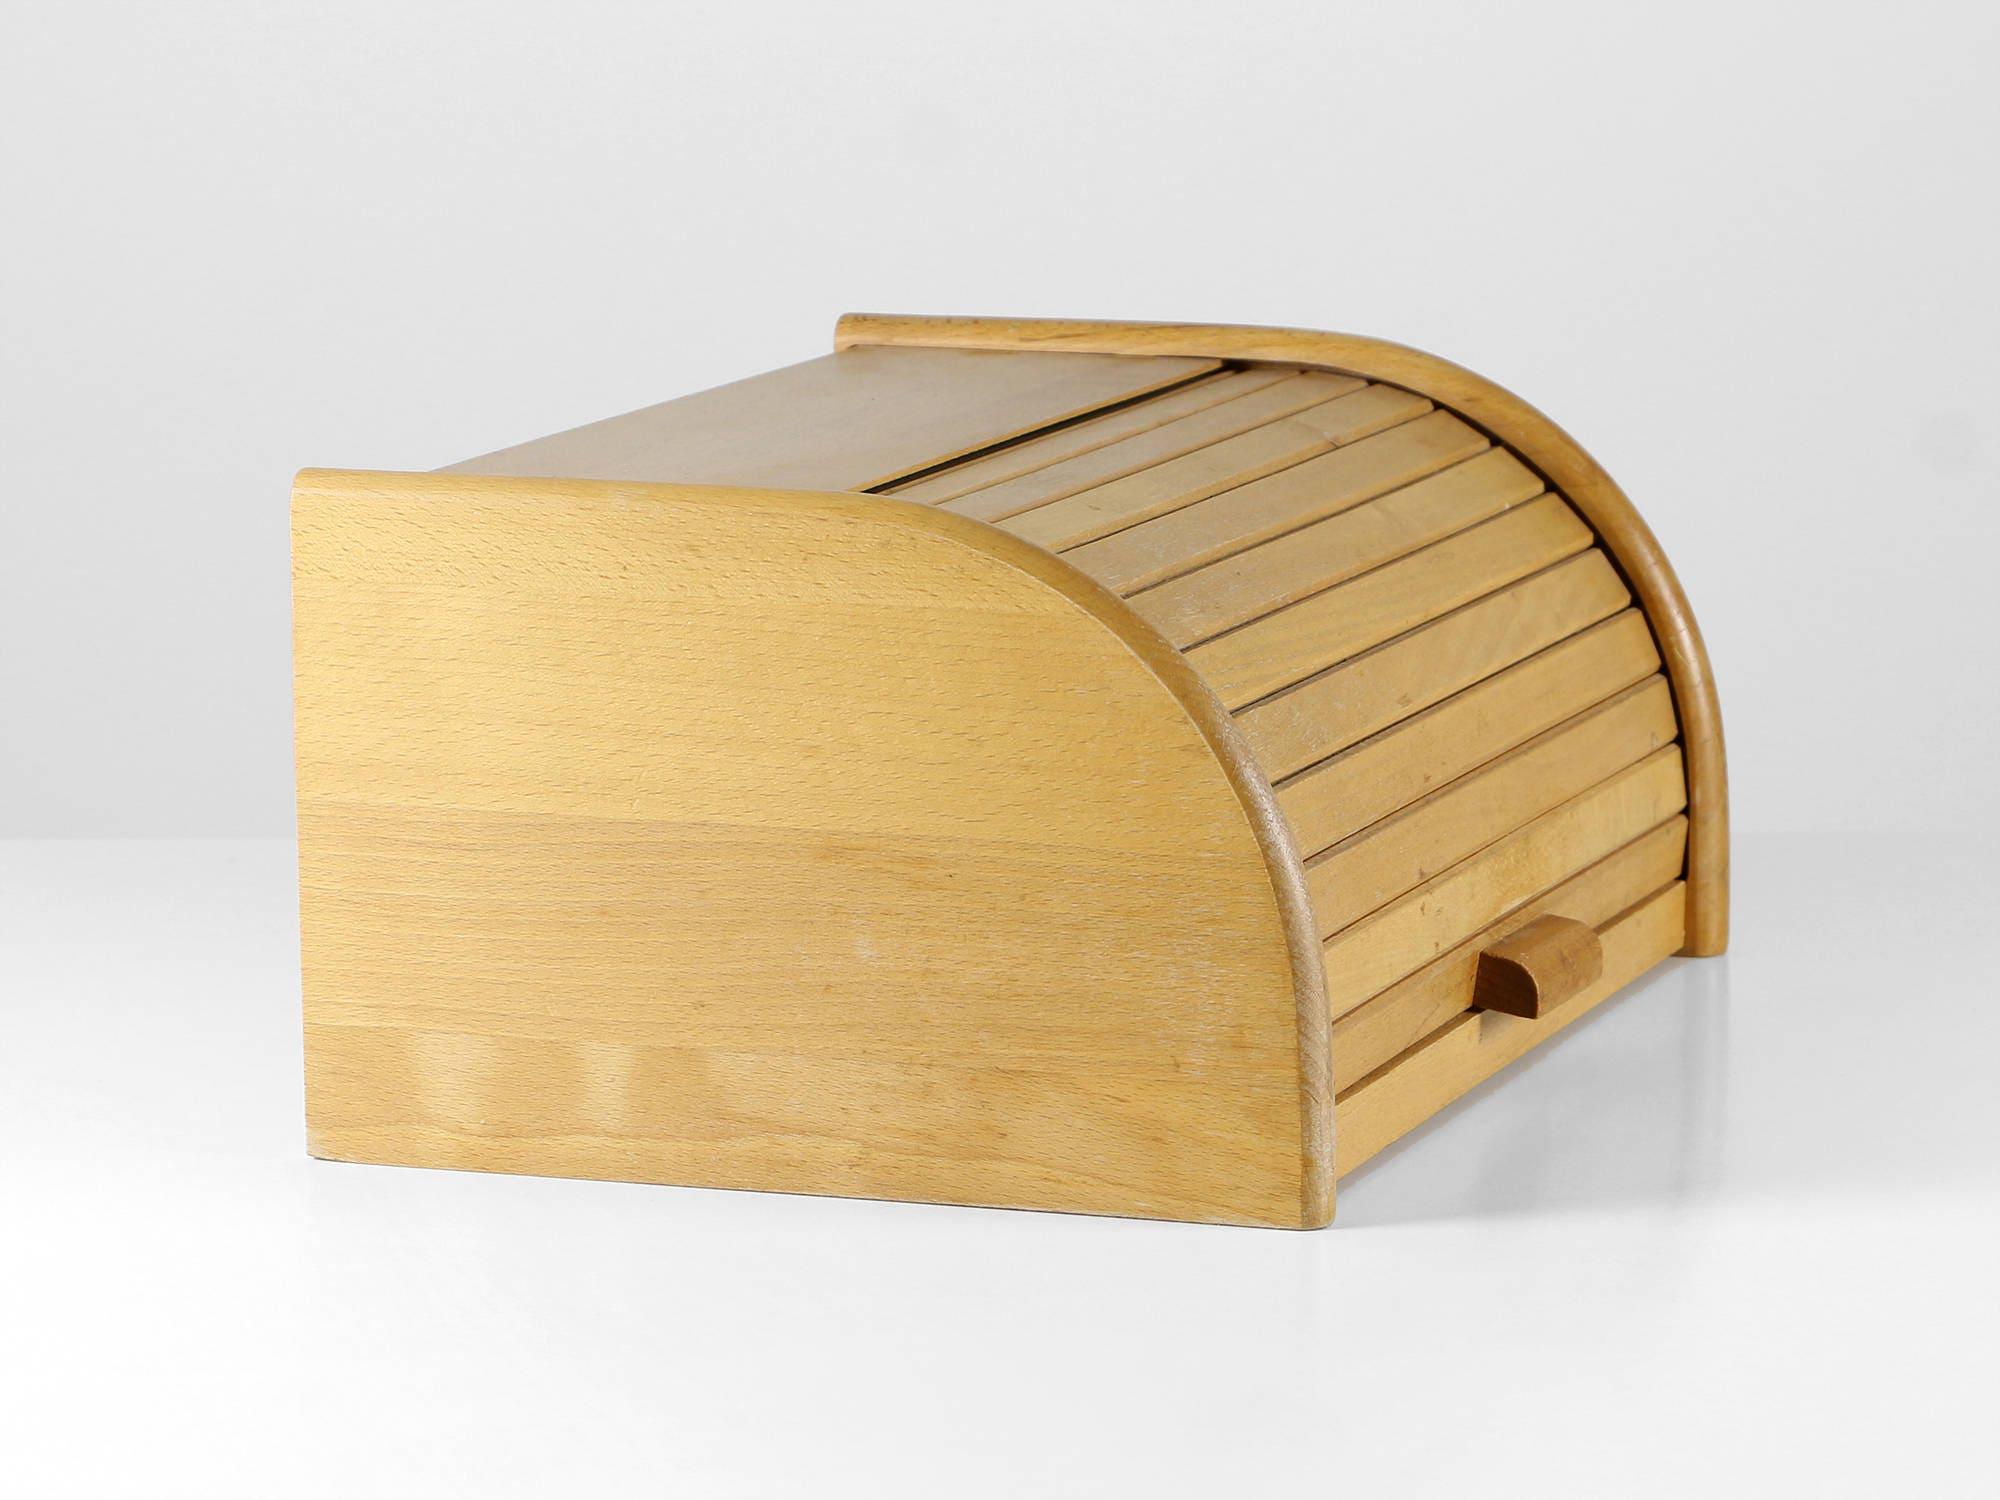 Vintage Bread Box, 60s Bread Box, Wooden Storage Box, Rolling Lid Bread Box